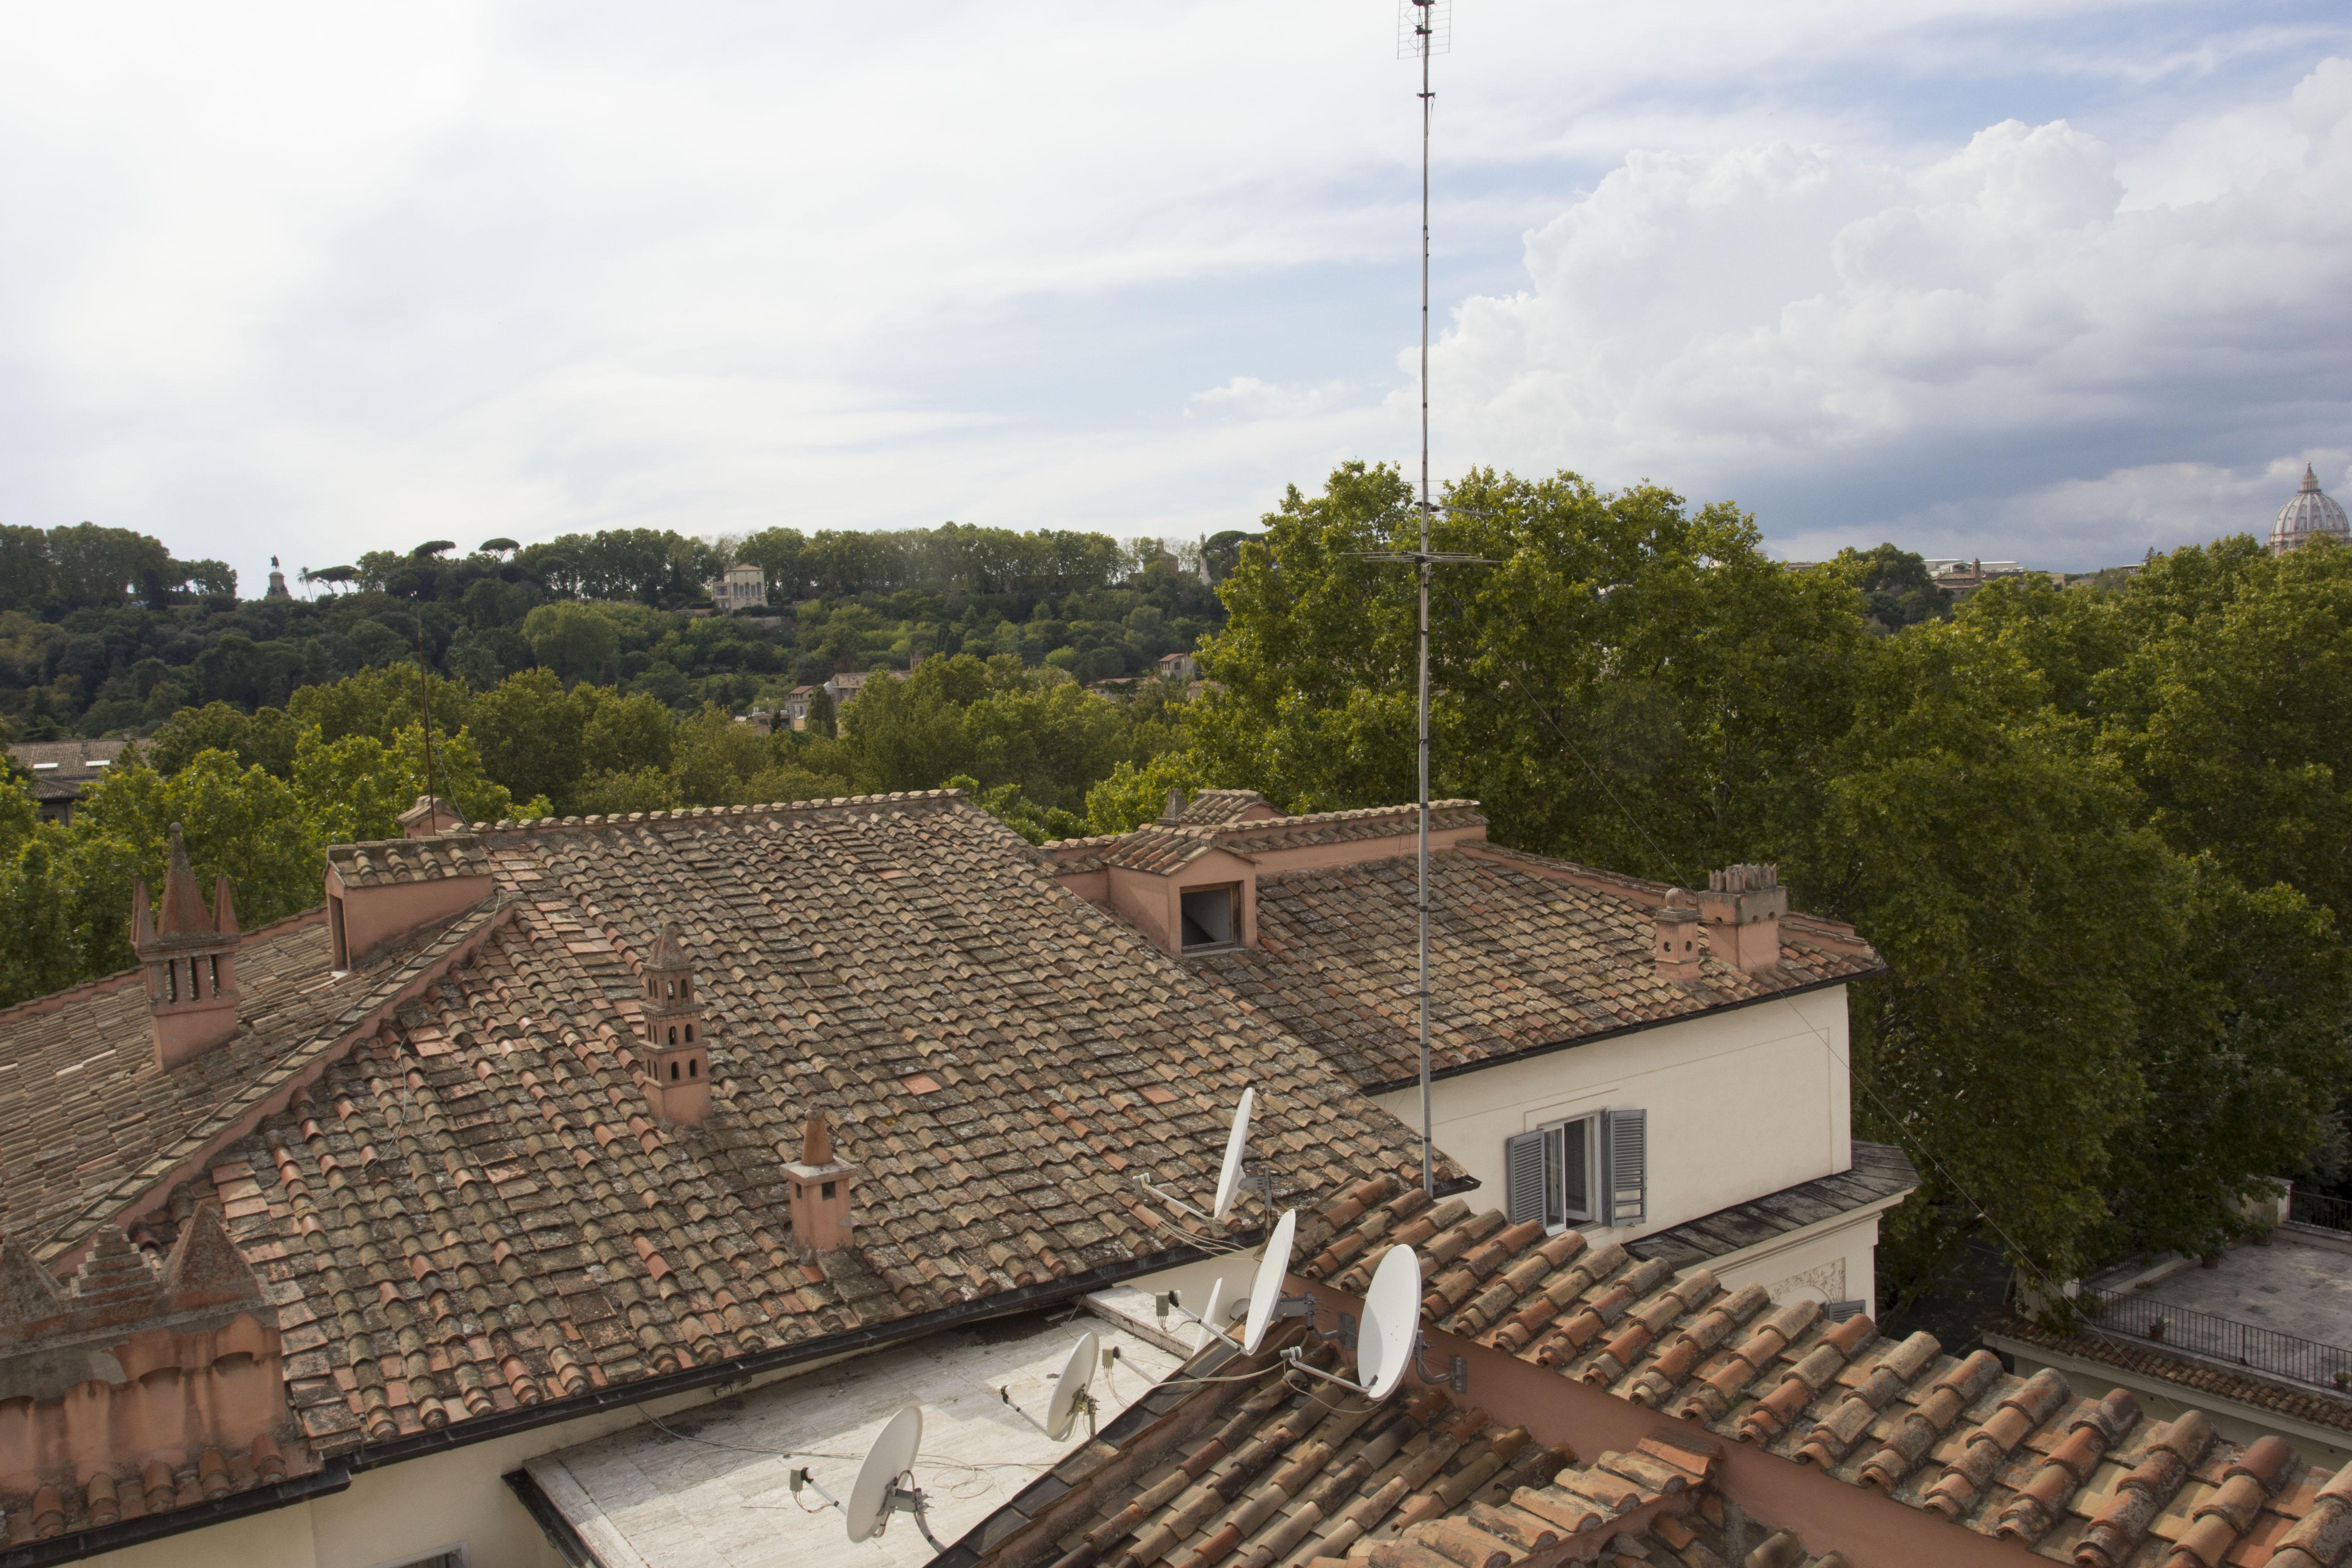 Falconieri_02137